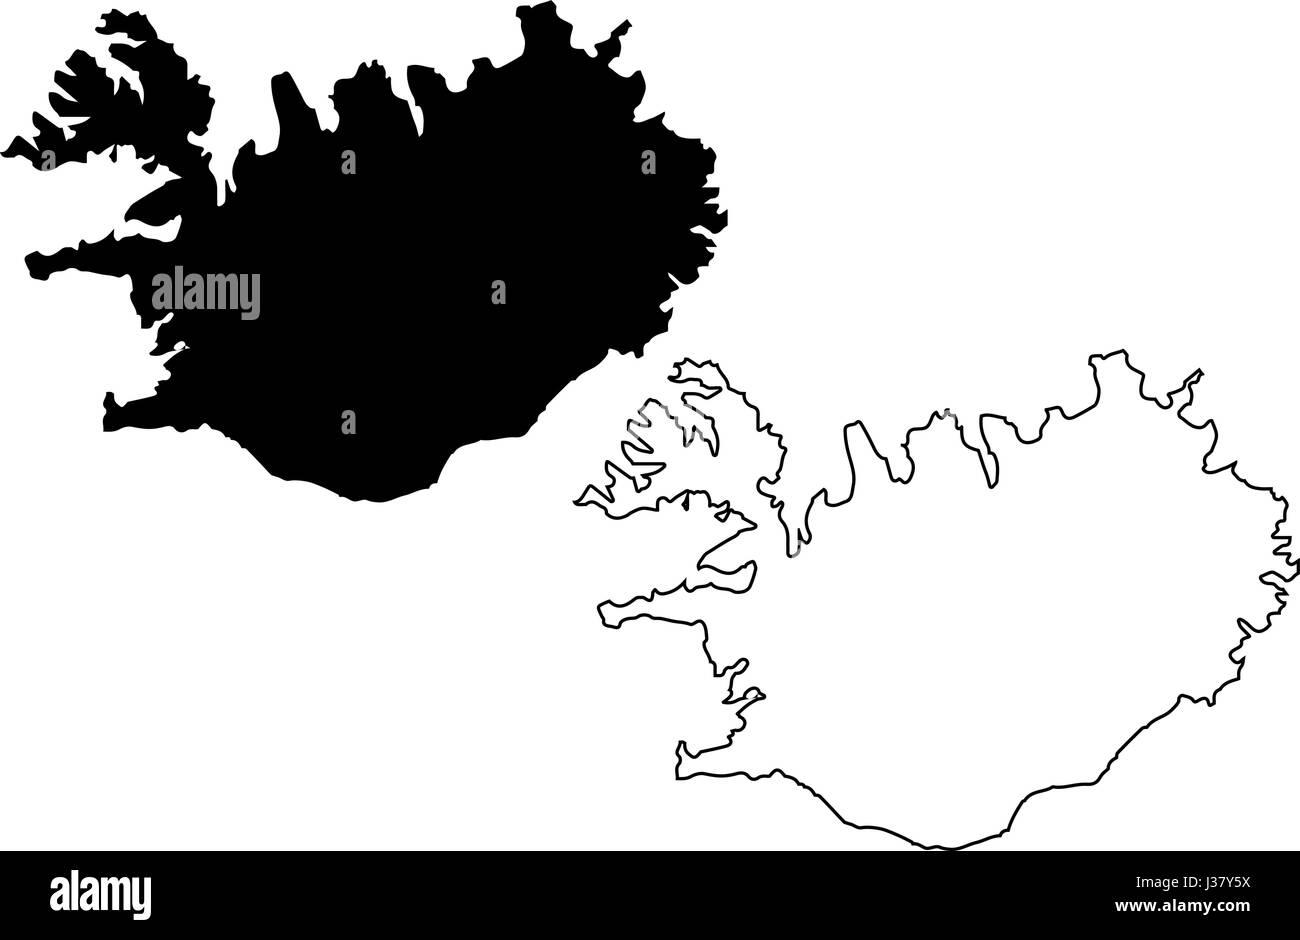 Iceland Map Vector Stockfotos & Iceland Map Vector Bilder ...